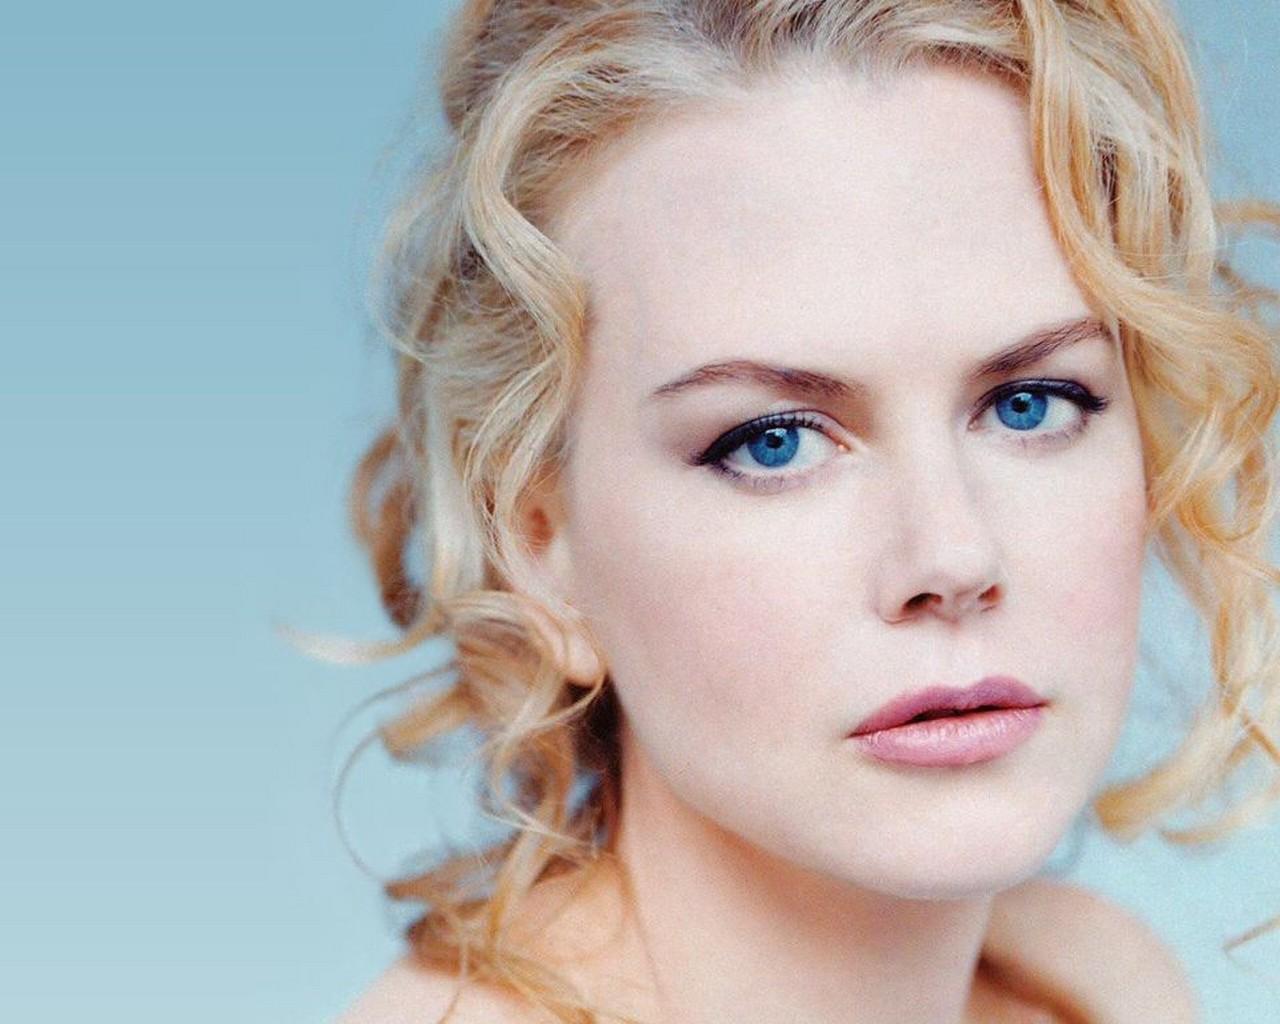 http://4.bp.blogspot.com/-vi8C8QDr3TQ/UId1pXcv3wI/AAAAAAAAAEc/h6FJoQYhQiY/s1600/Nicole_Kidman.jpg